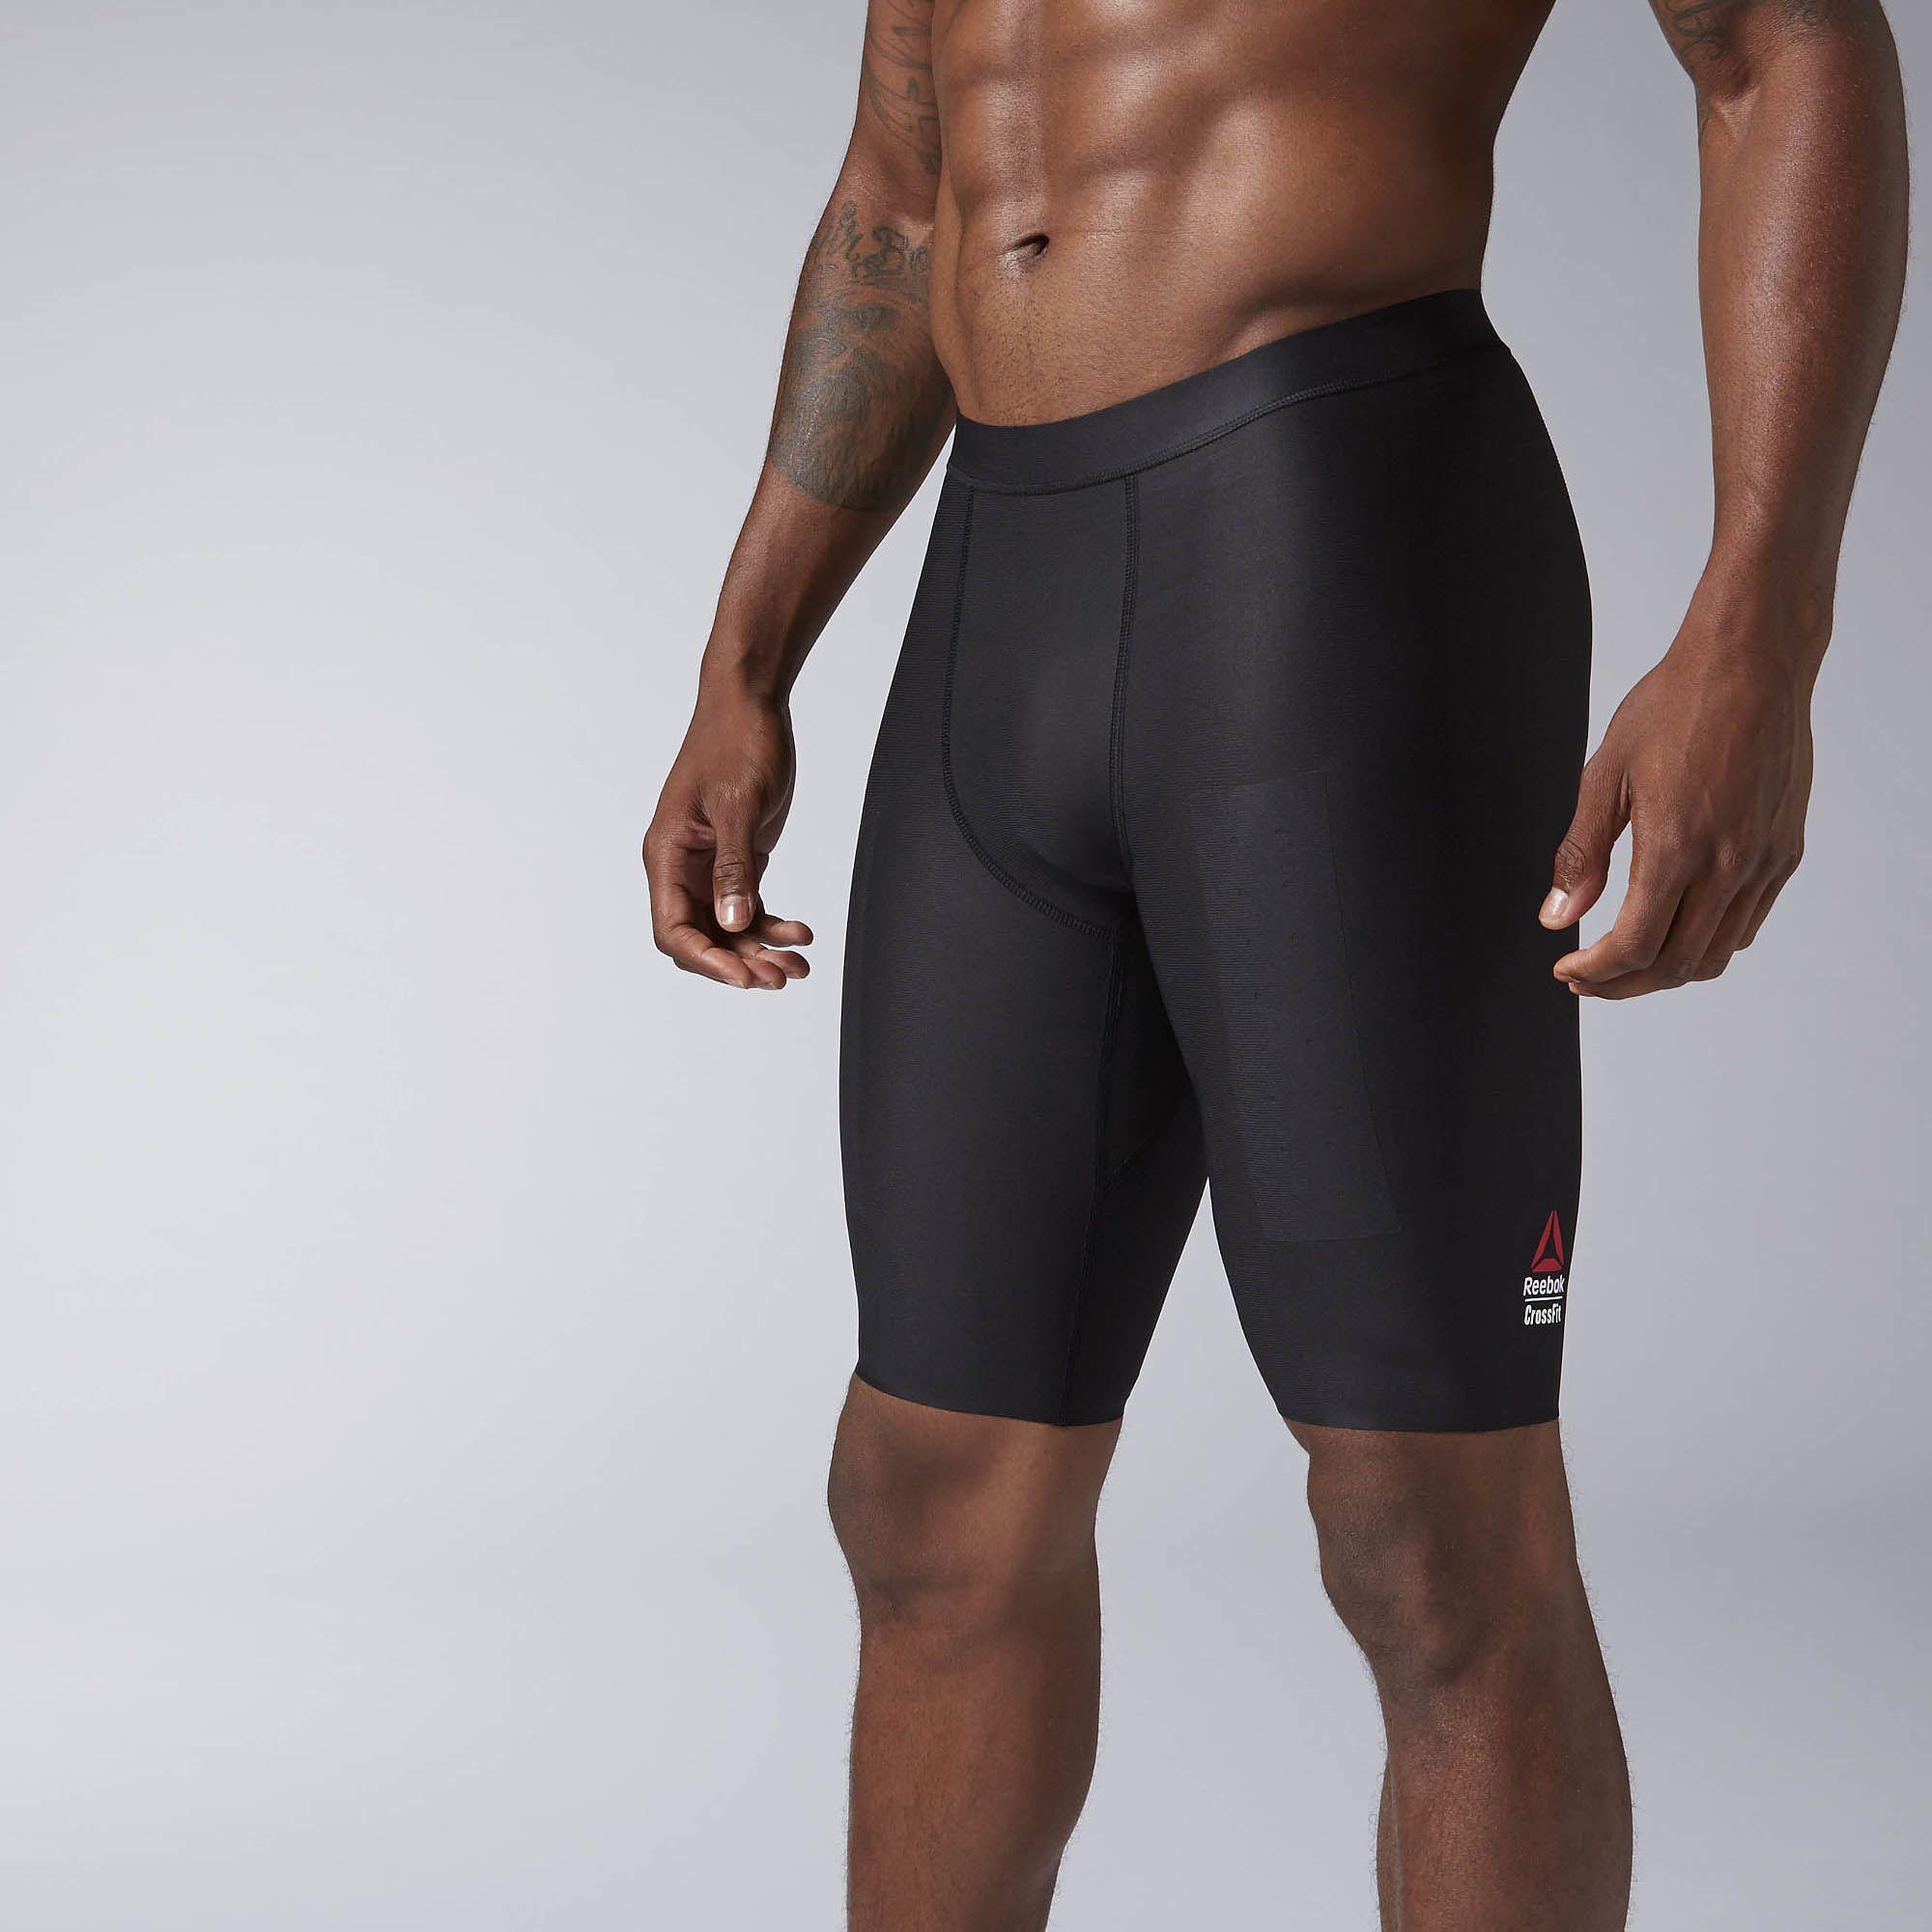 Compression Shorts compression shorts: what you get for the money | compression+design FJYRSKI